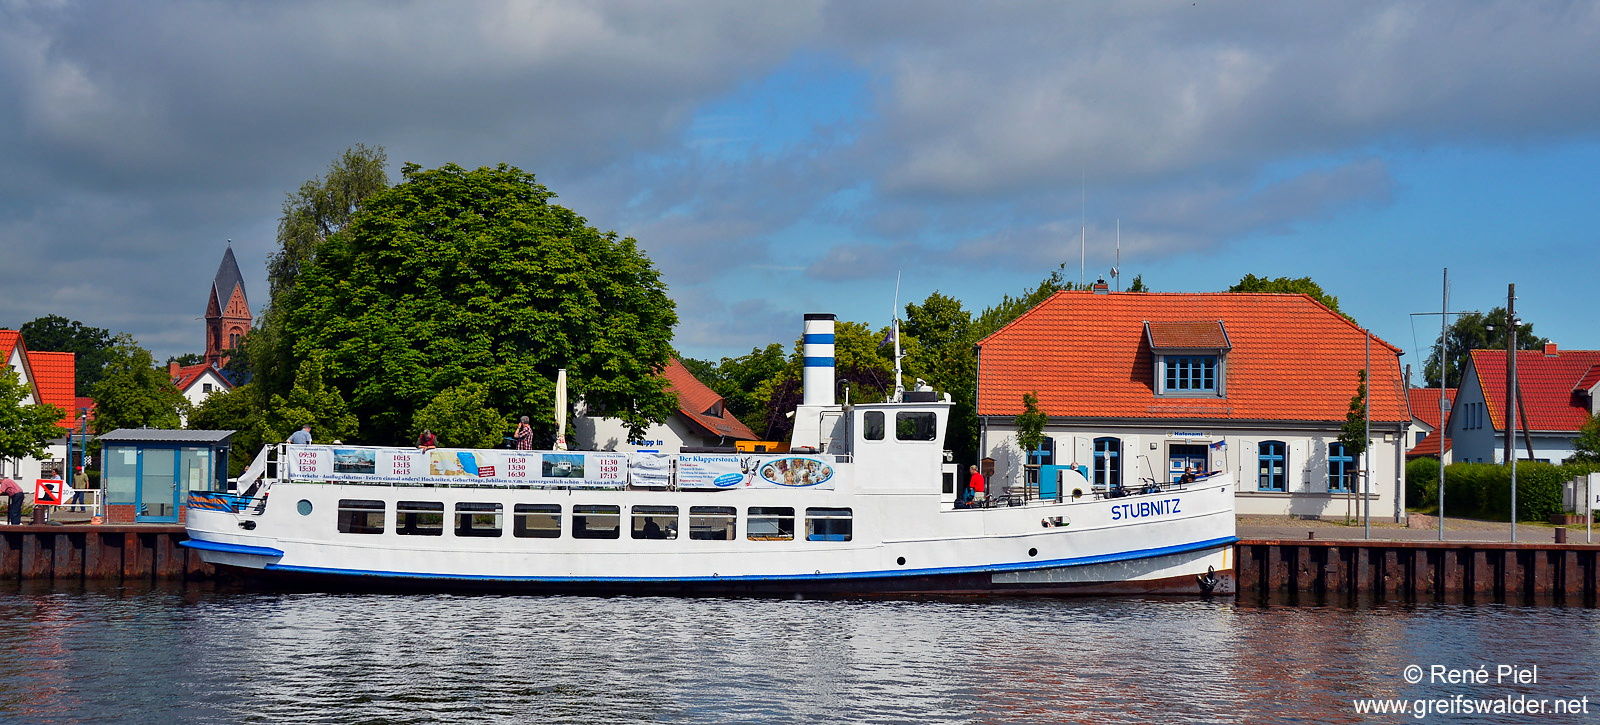 Fahrgastschiff MS Stubnitz in Greifswald-Wieck